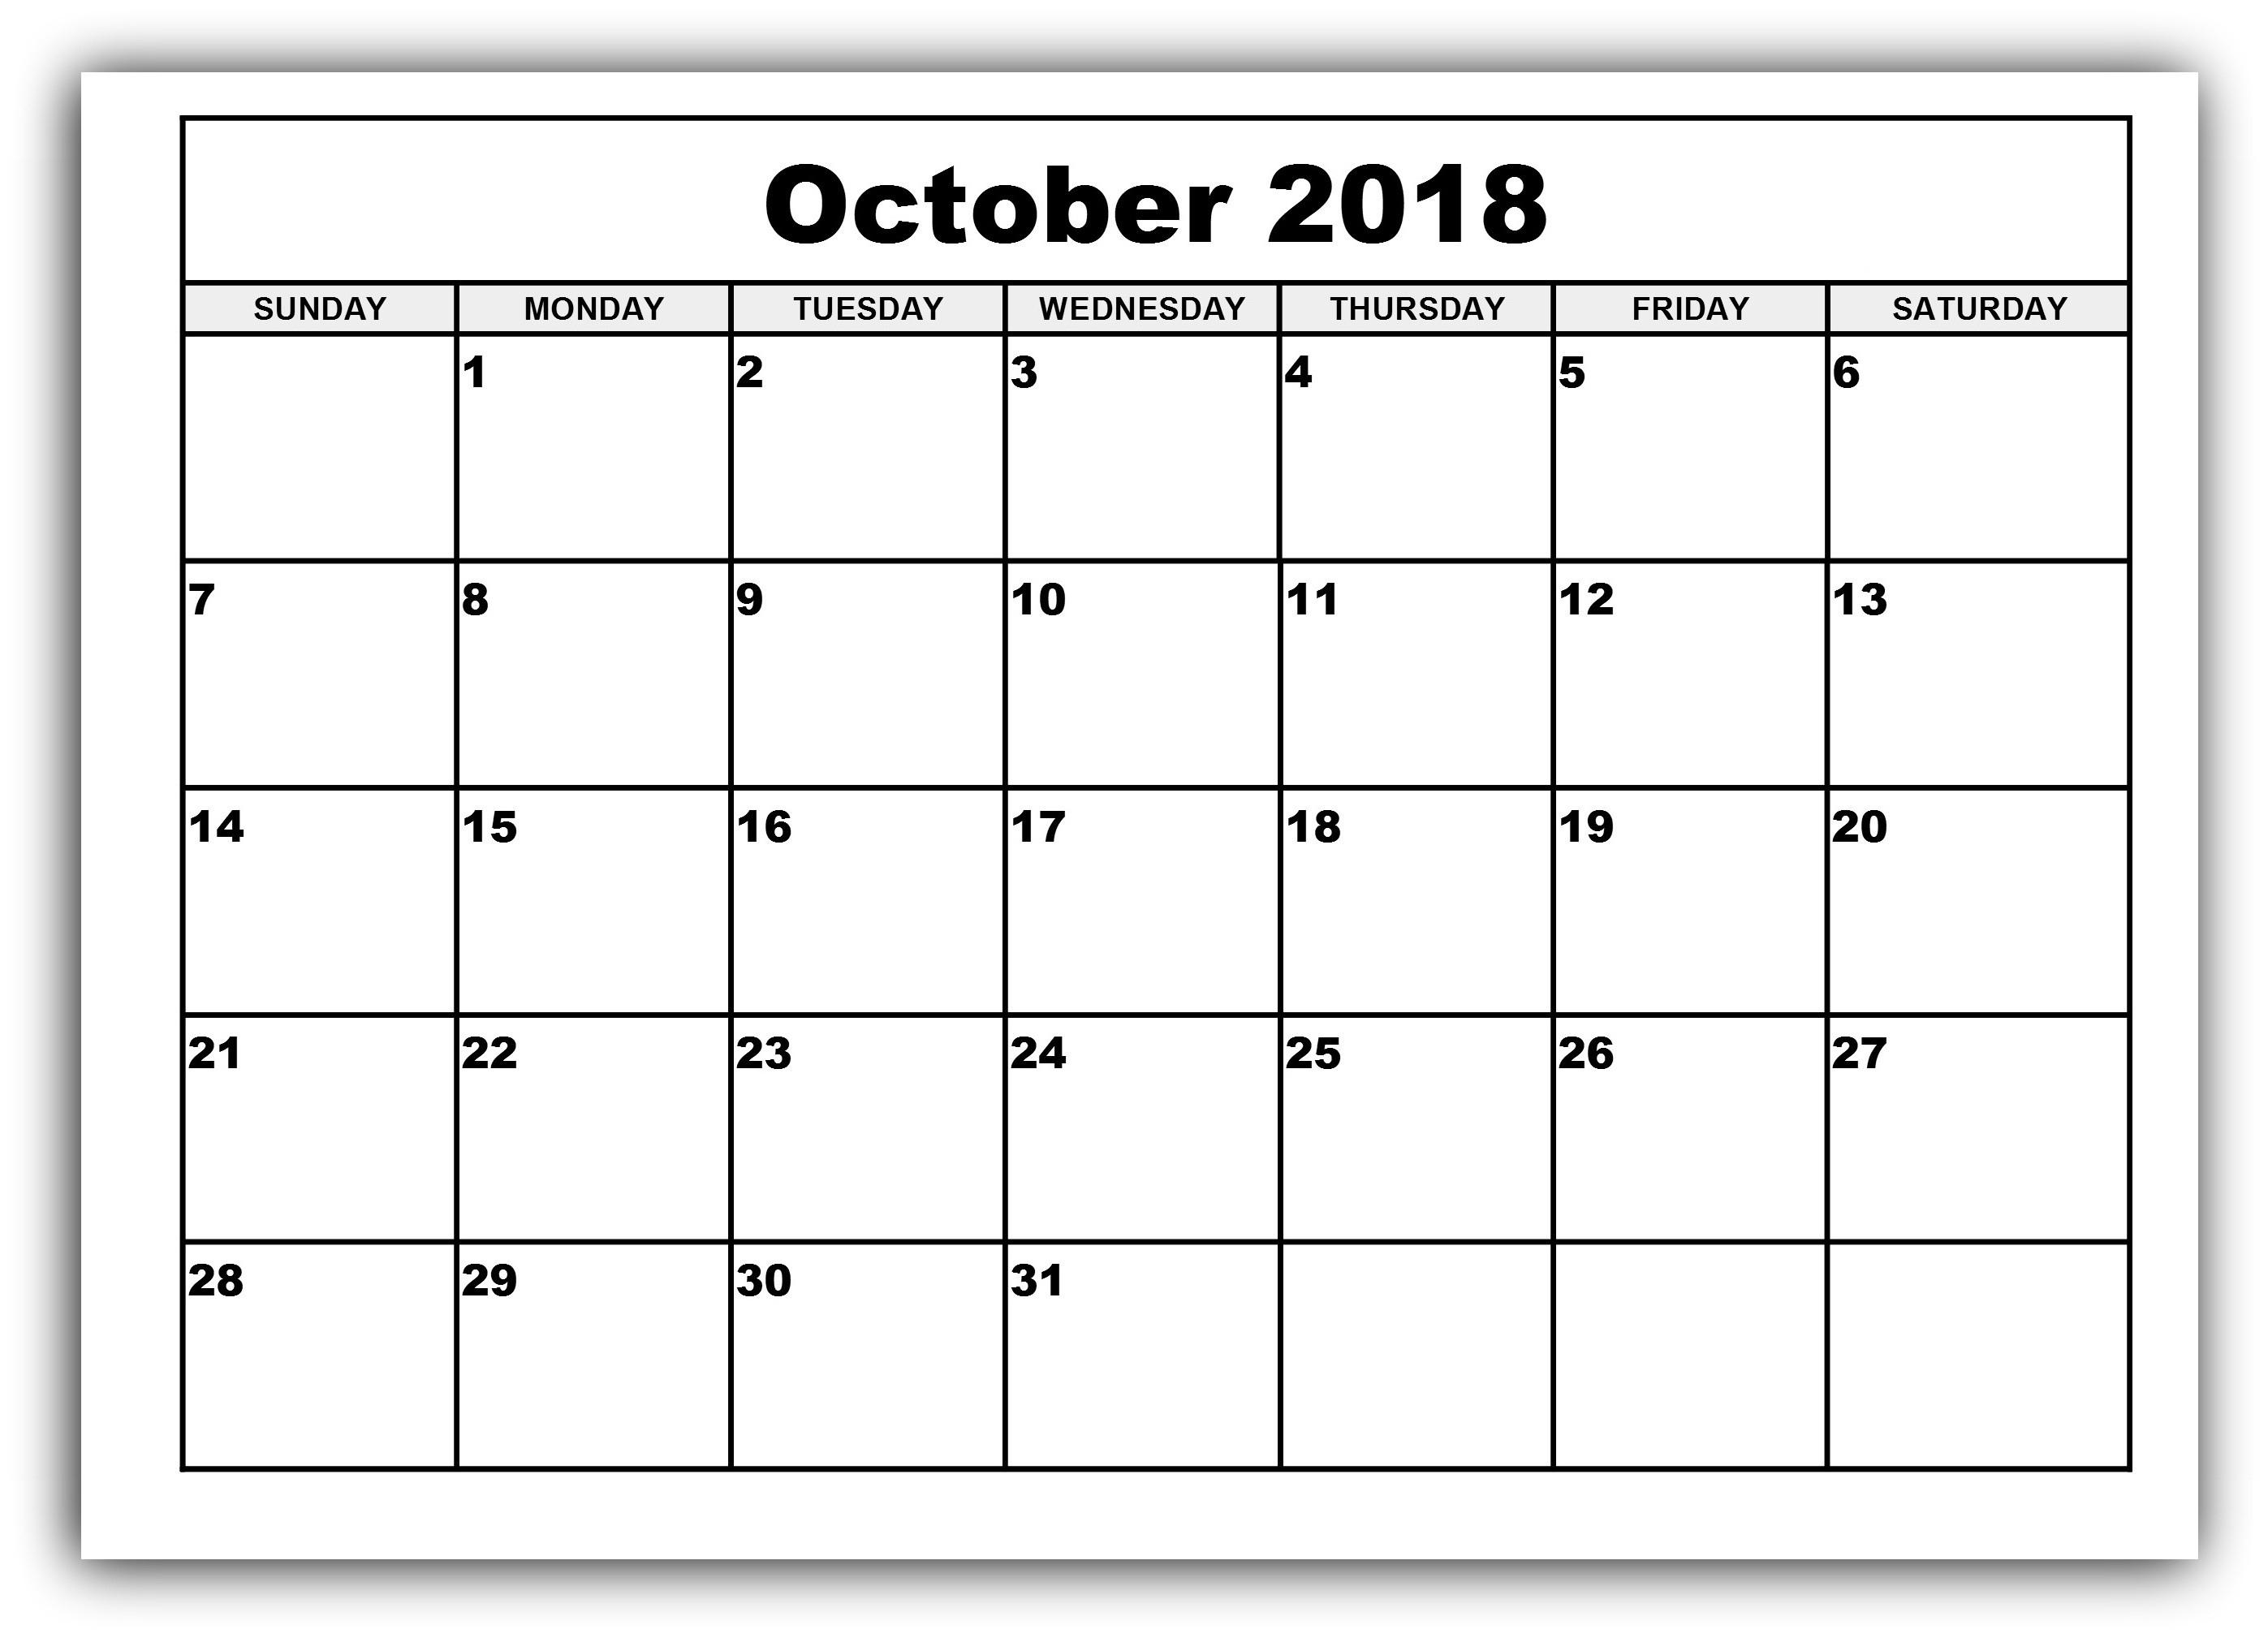 014 Get October Blank Printable Calendar Templates April Free with Monday To Sunday Calendar Template October